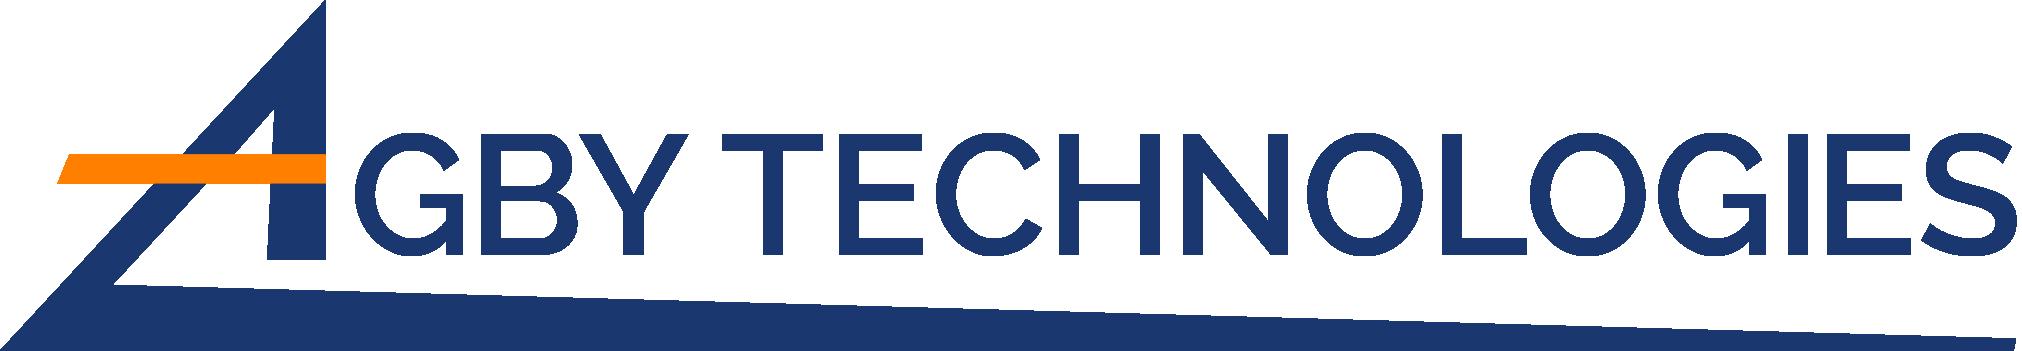 AgbyTechnologies_Logo_web (1).png